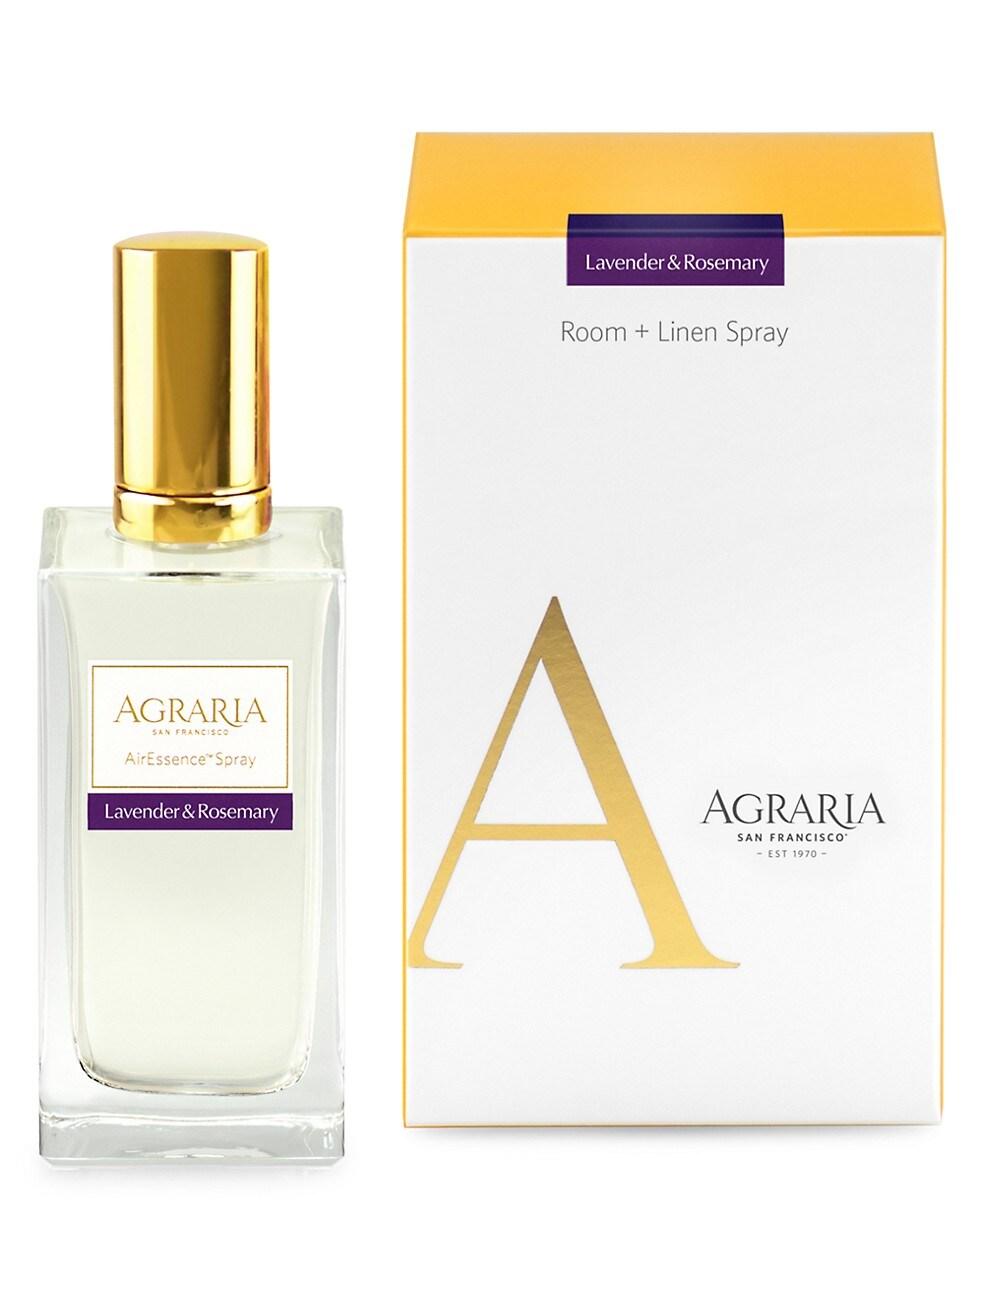 Agraria Lavender & Rosemary Room & Linen Spray